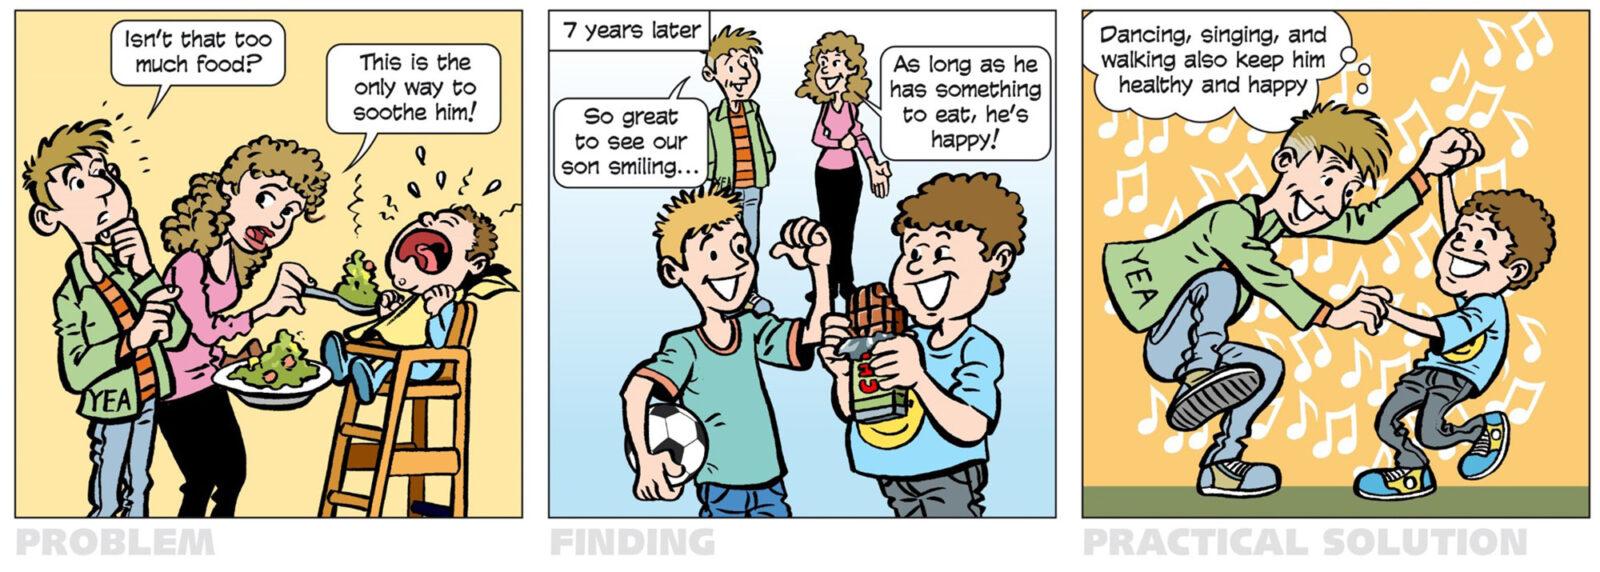 cartoon YEA – obesity